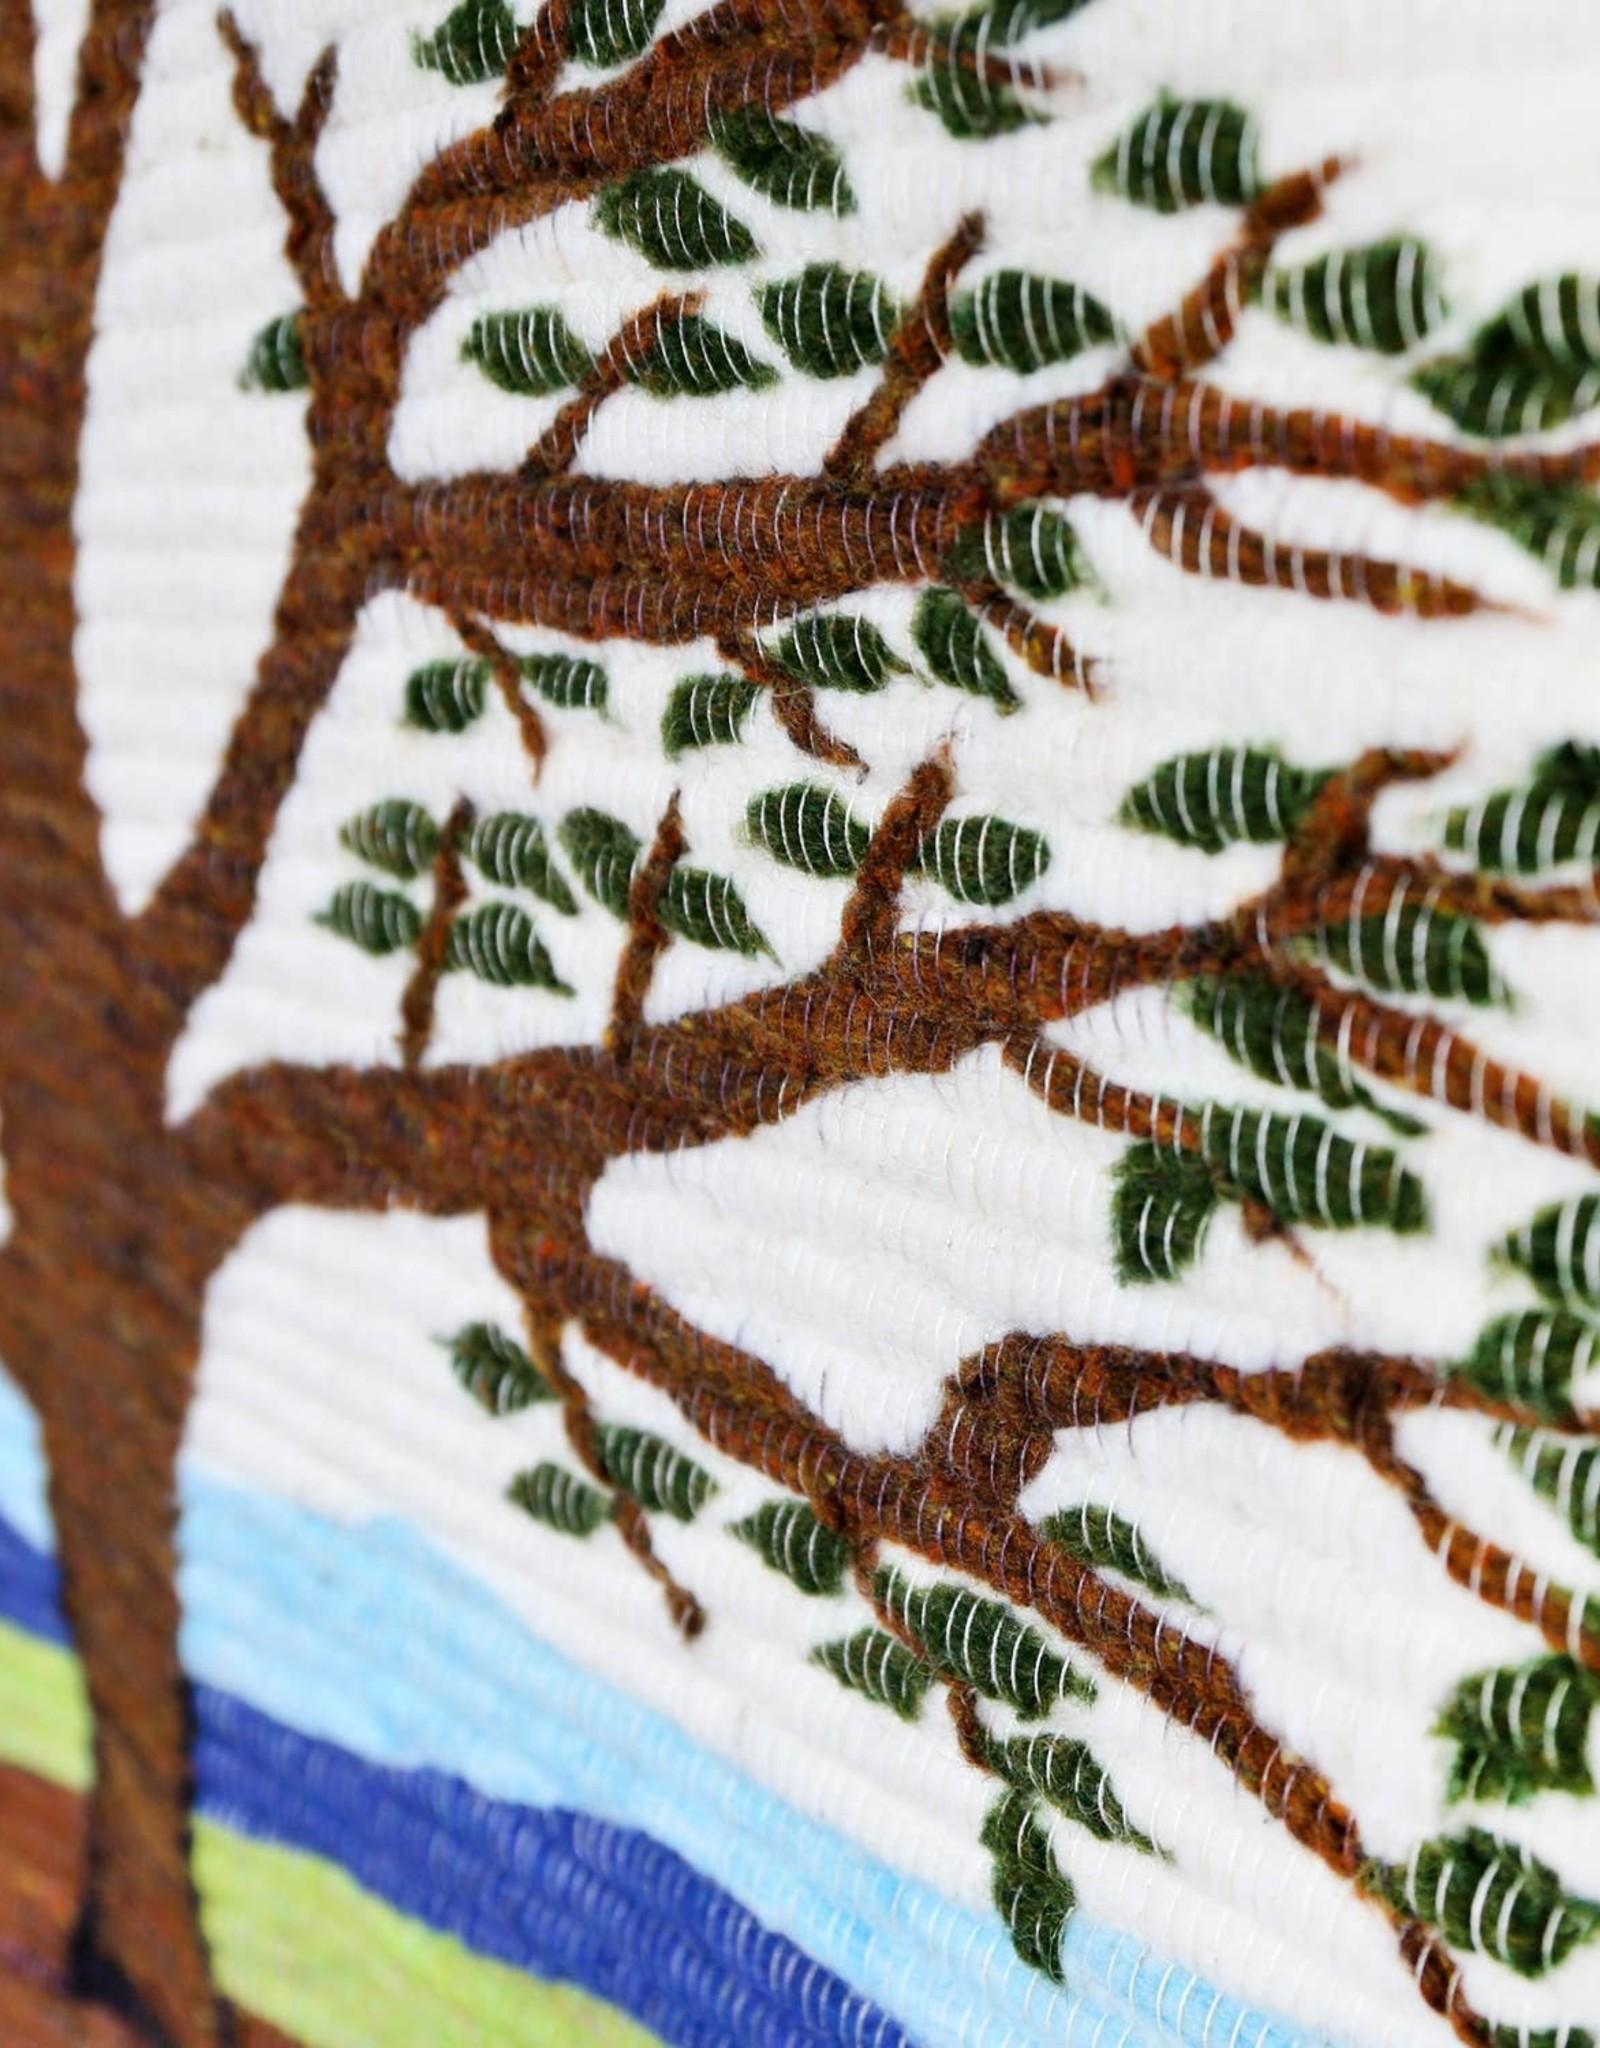 TTV USA Branching Life Wall Hanging